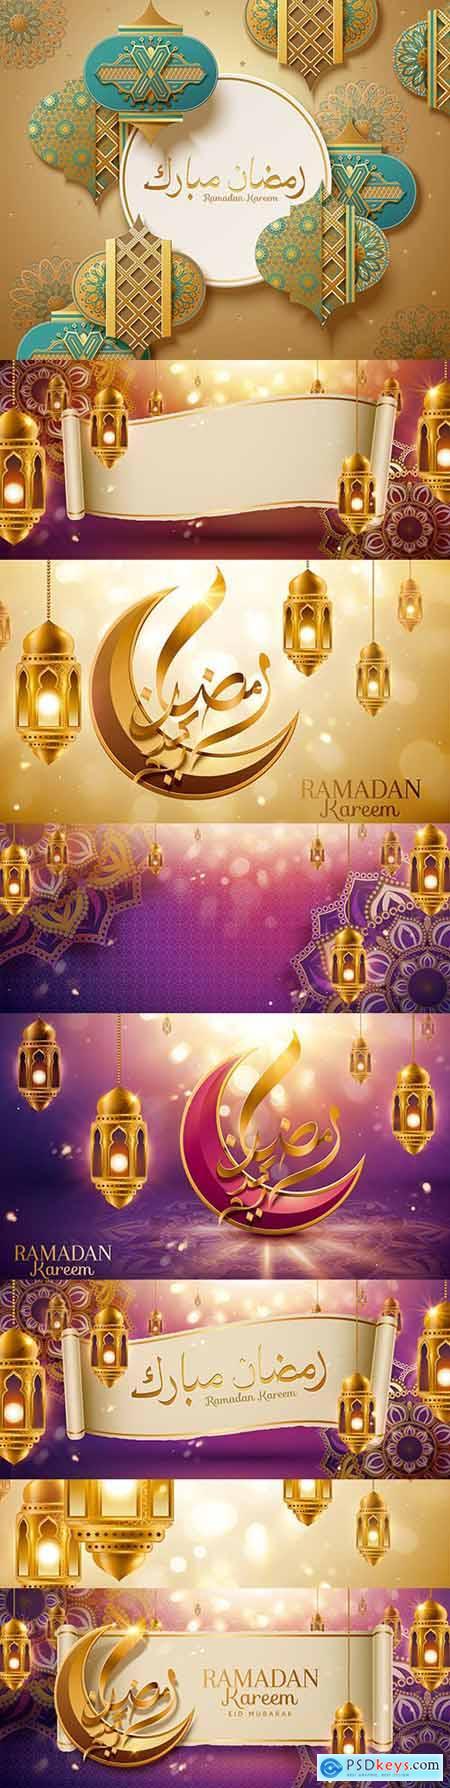 Calligraphy Ramadan Mubarak design happy holiday